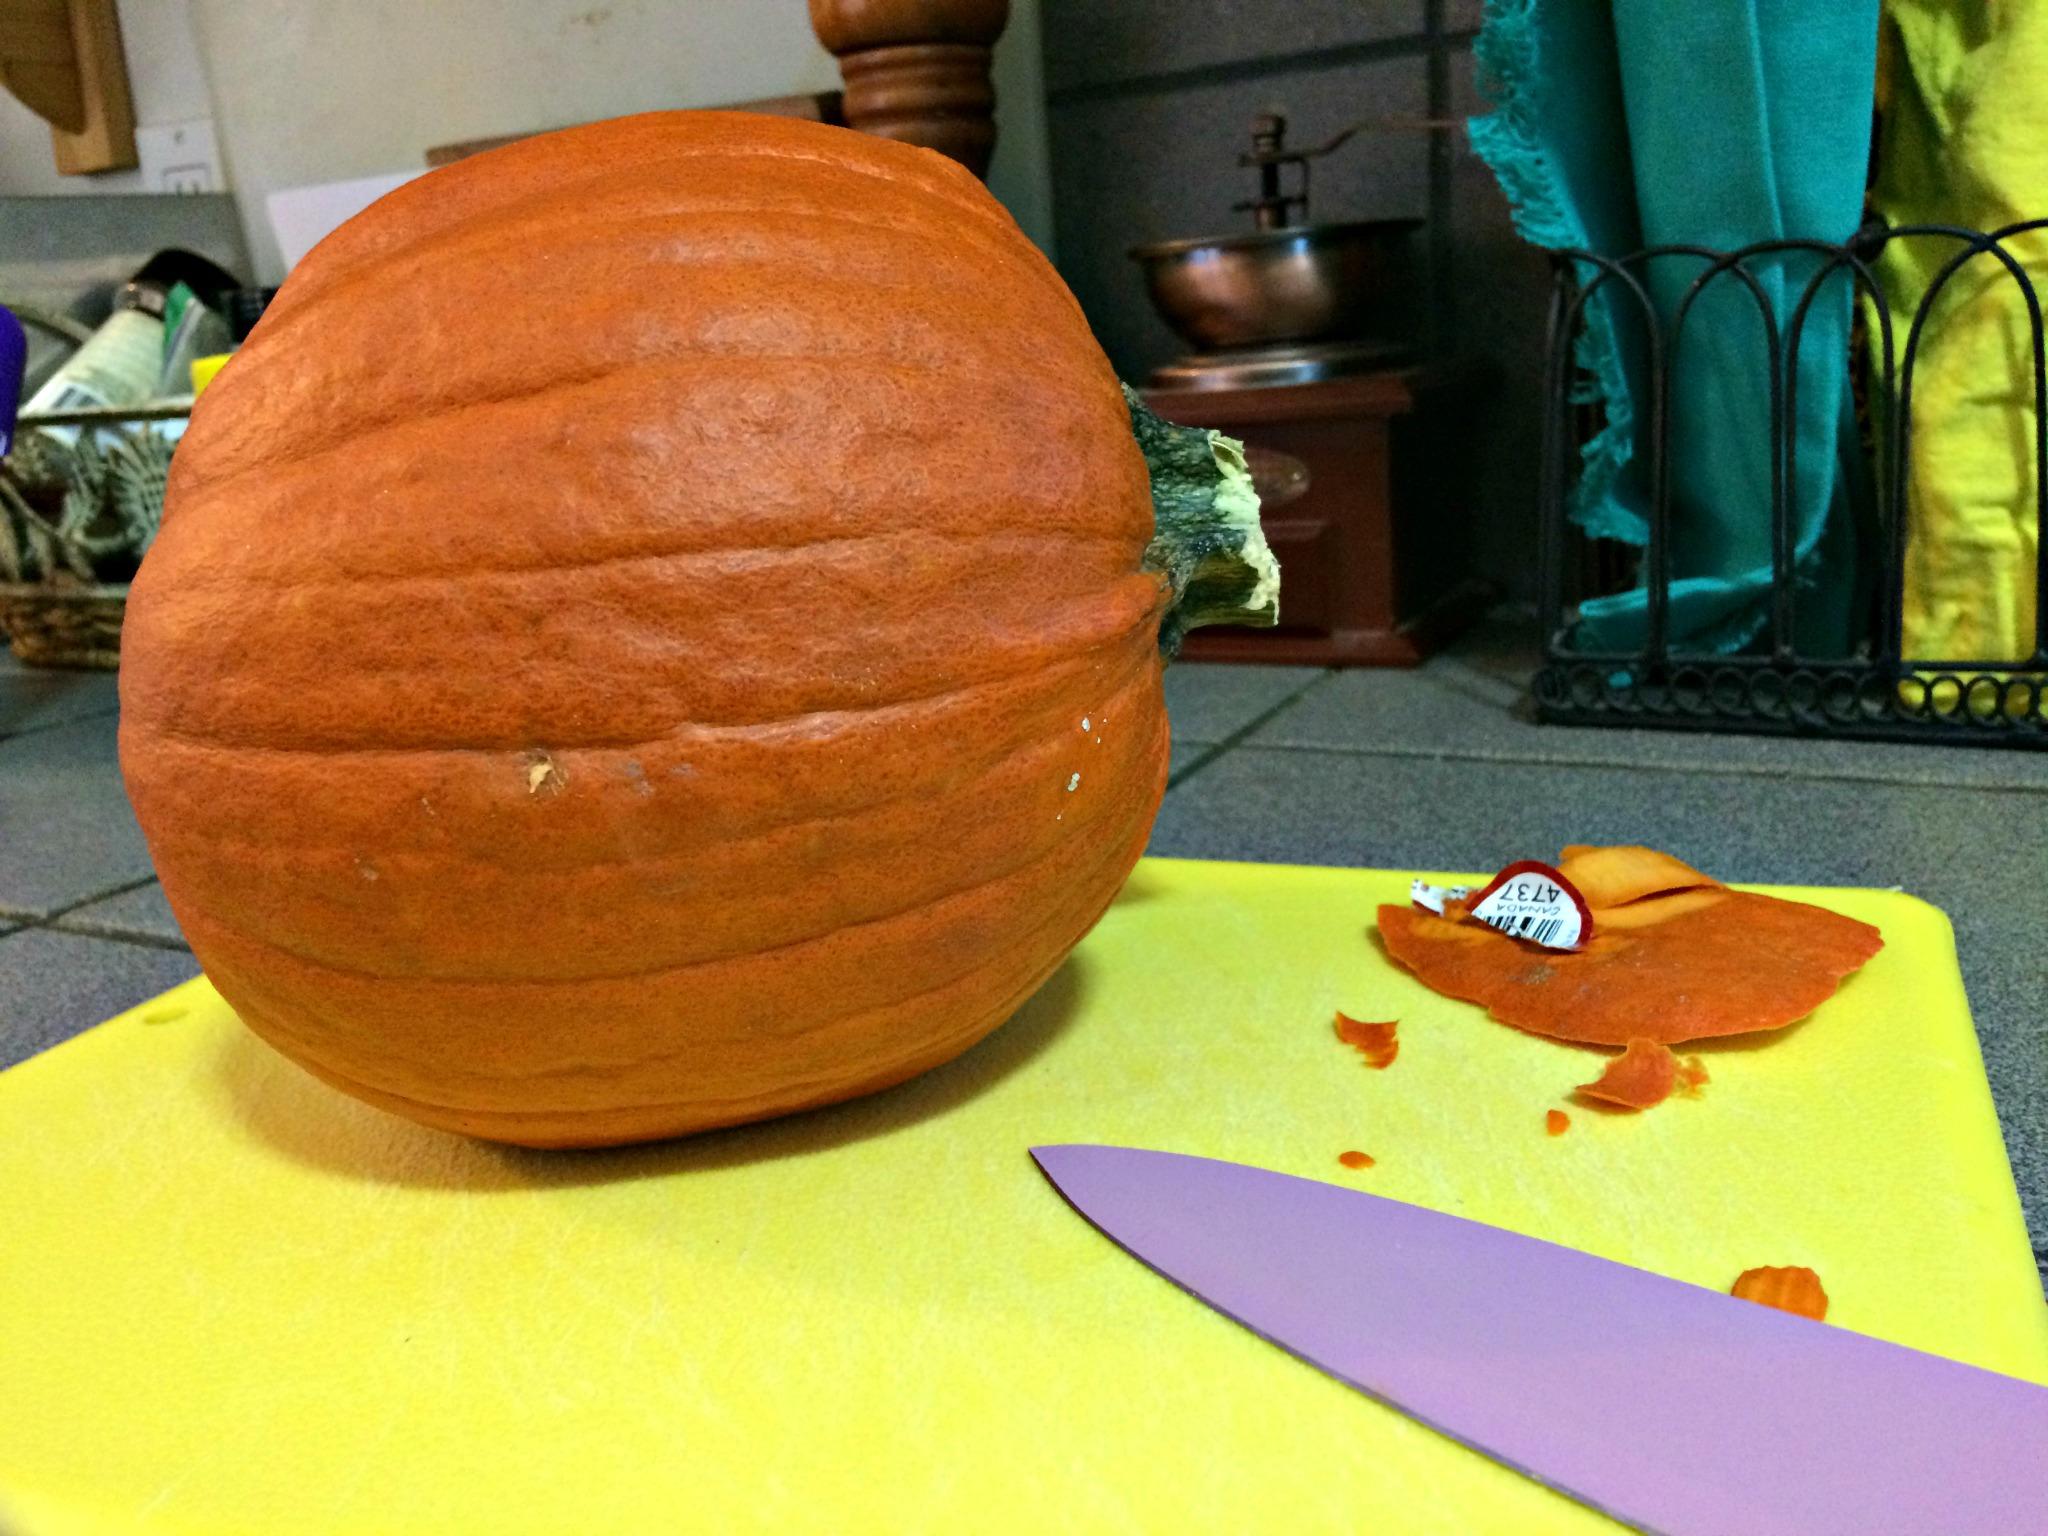 Pro tip: Slice some skin off your pumpkin so it lies flat. Making pumpkin puree become a breeze!